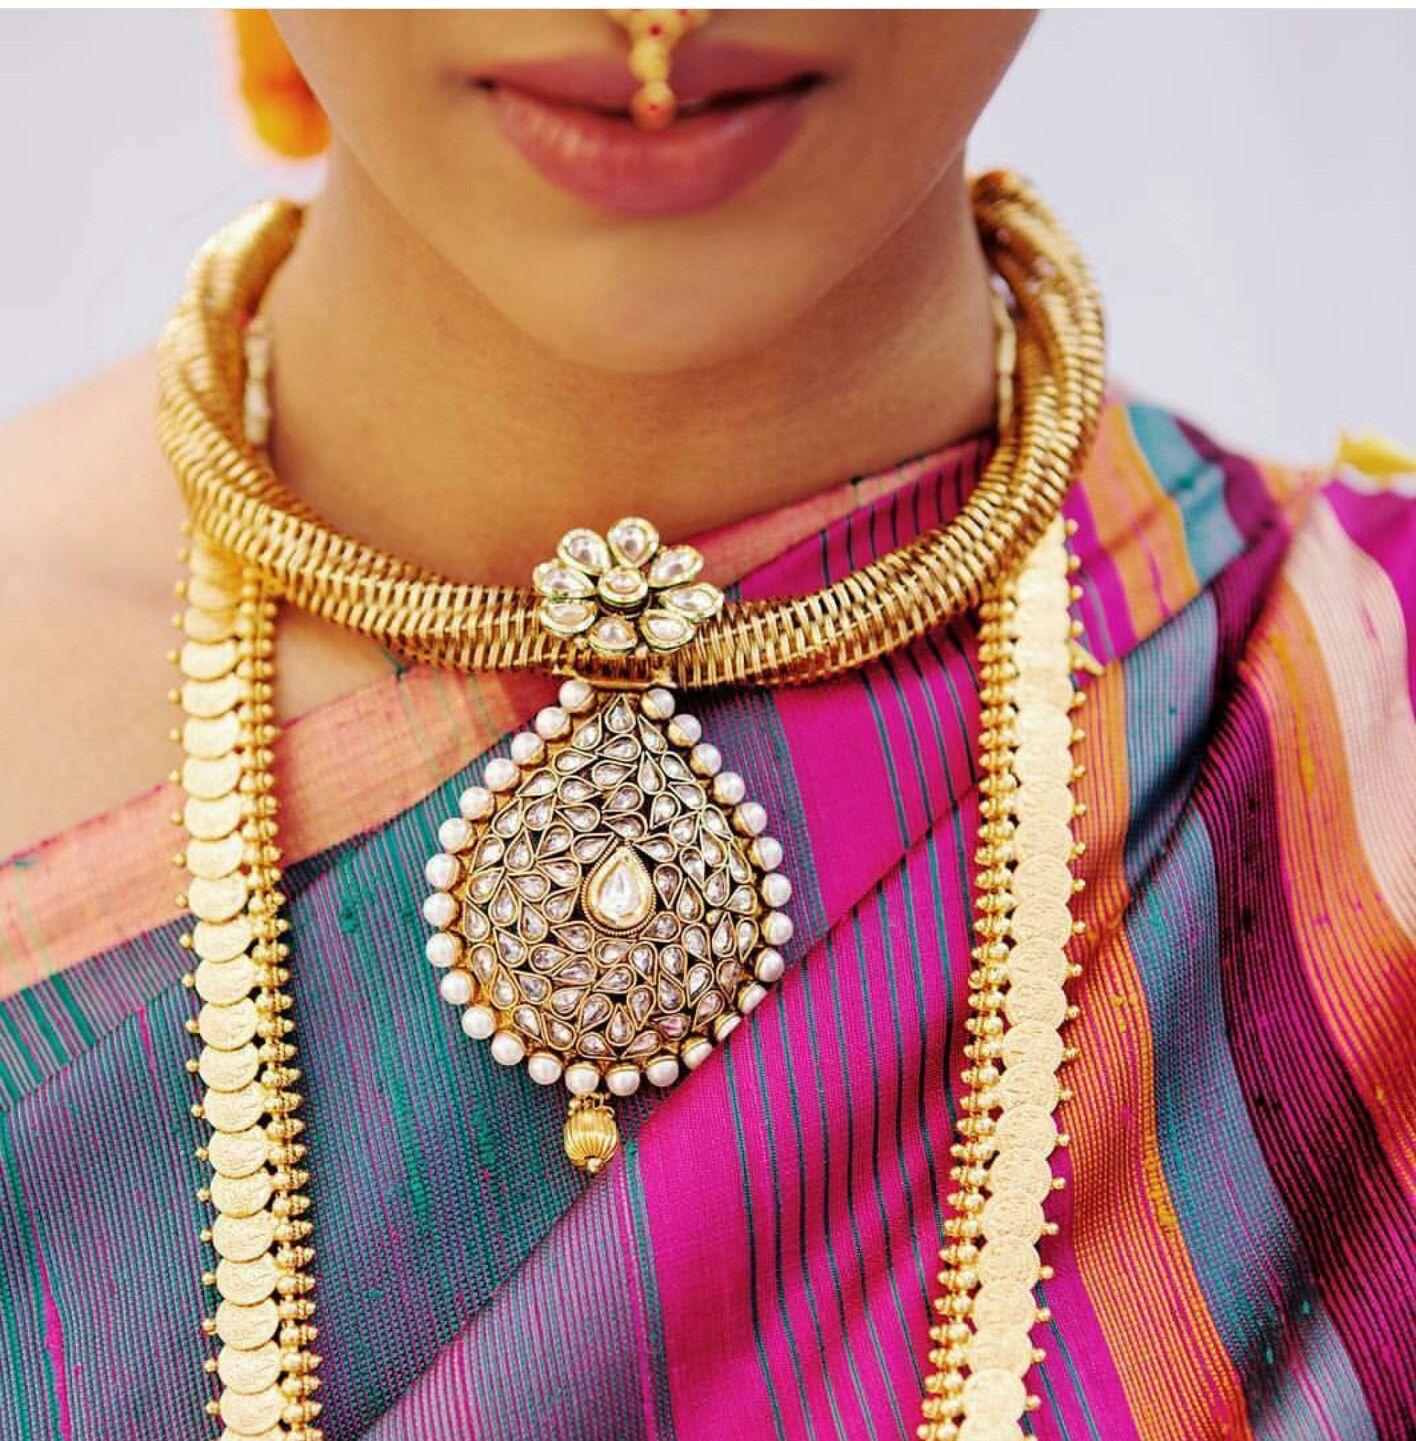 Pin by mayuran sritharan on wedding ceremony pinterest